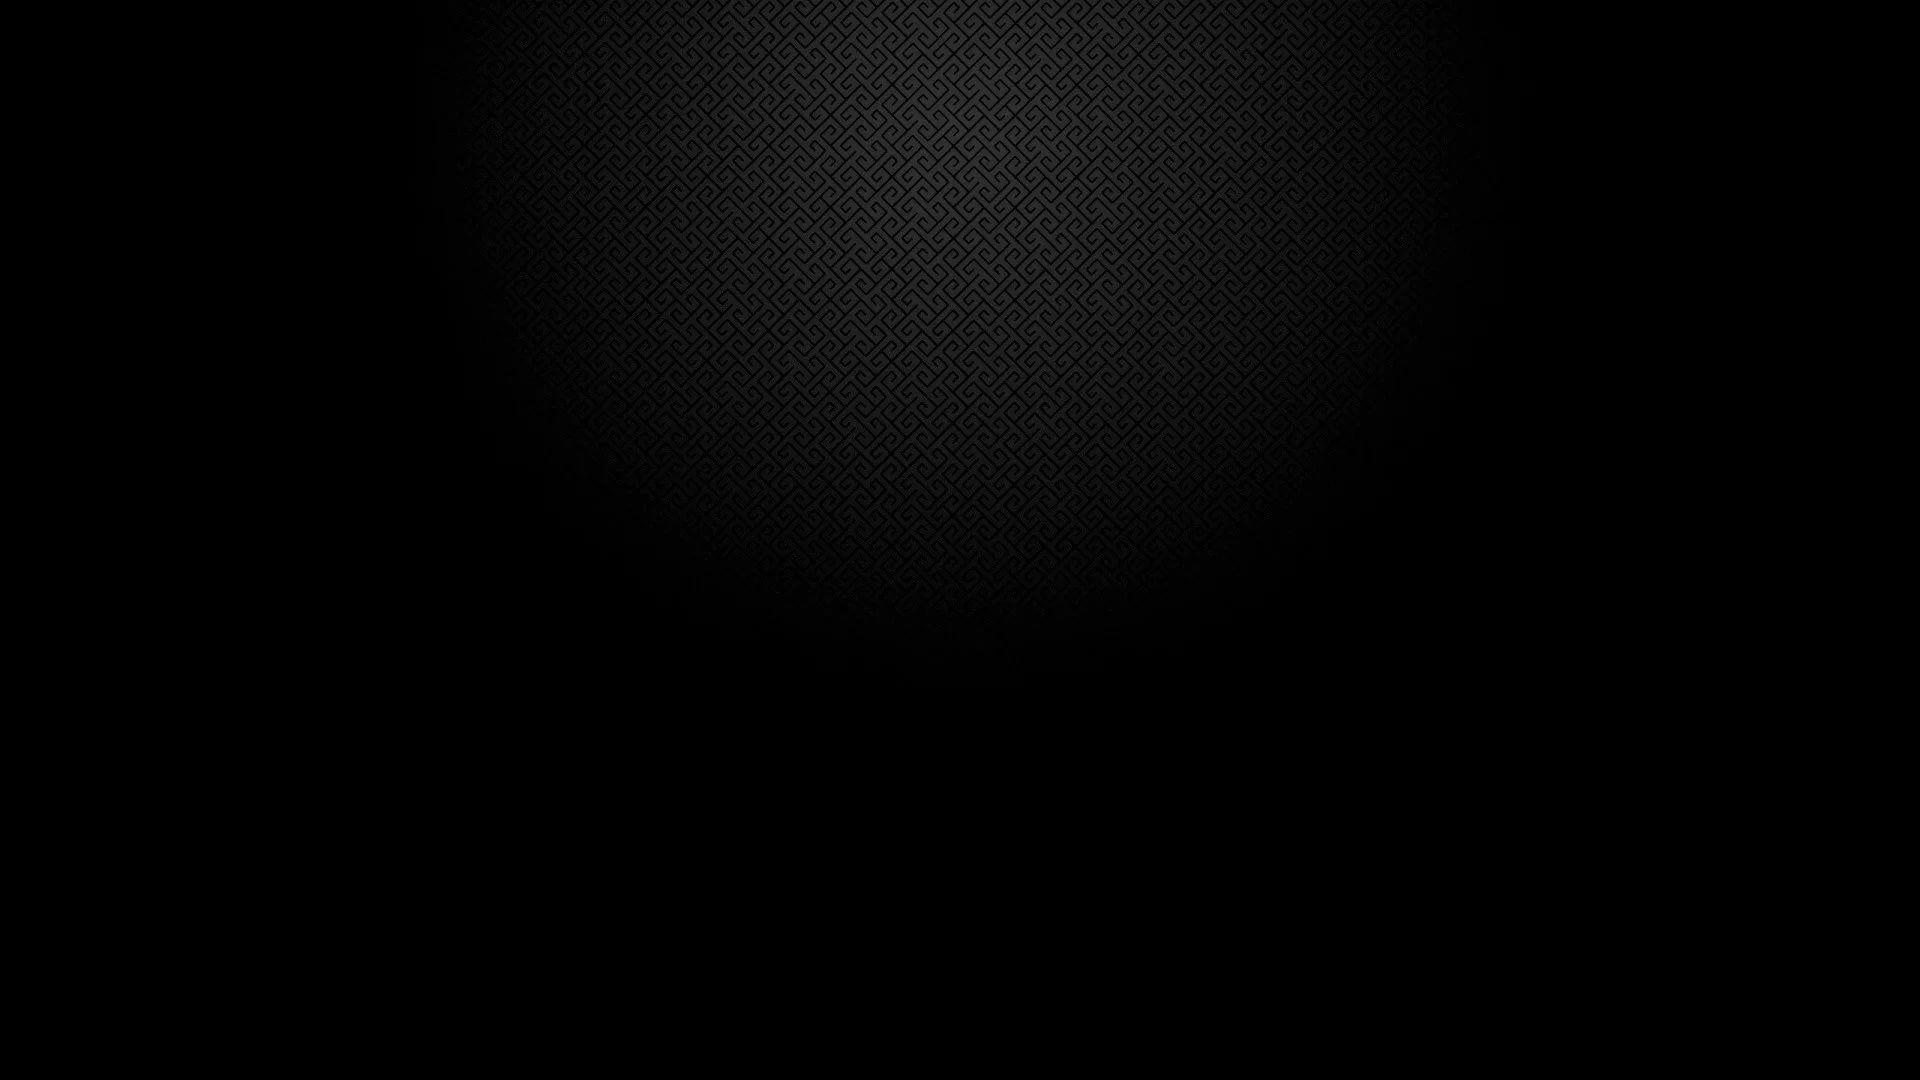 Black Screen Wallpaper Picture